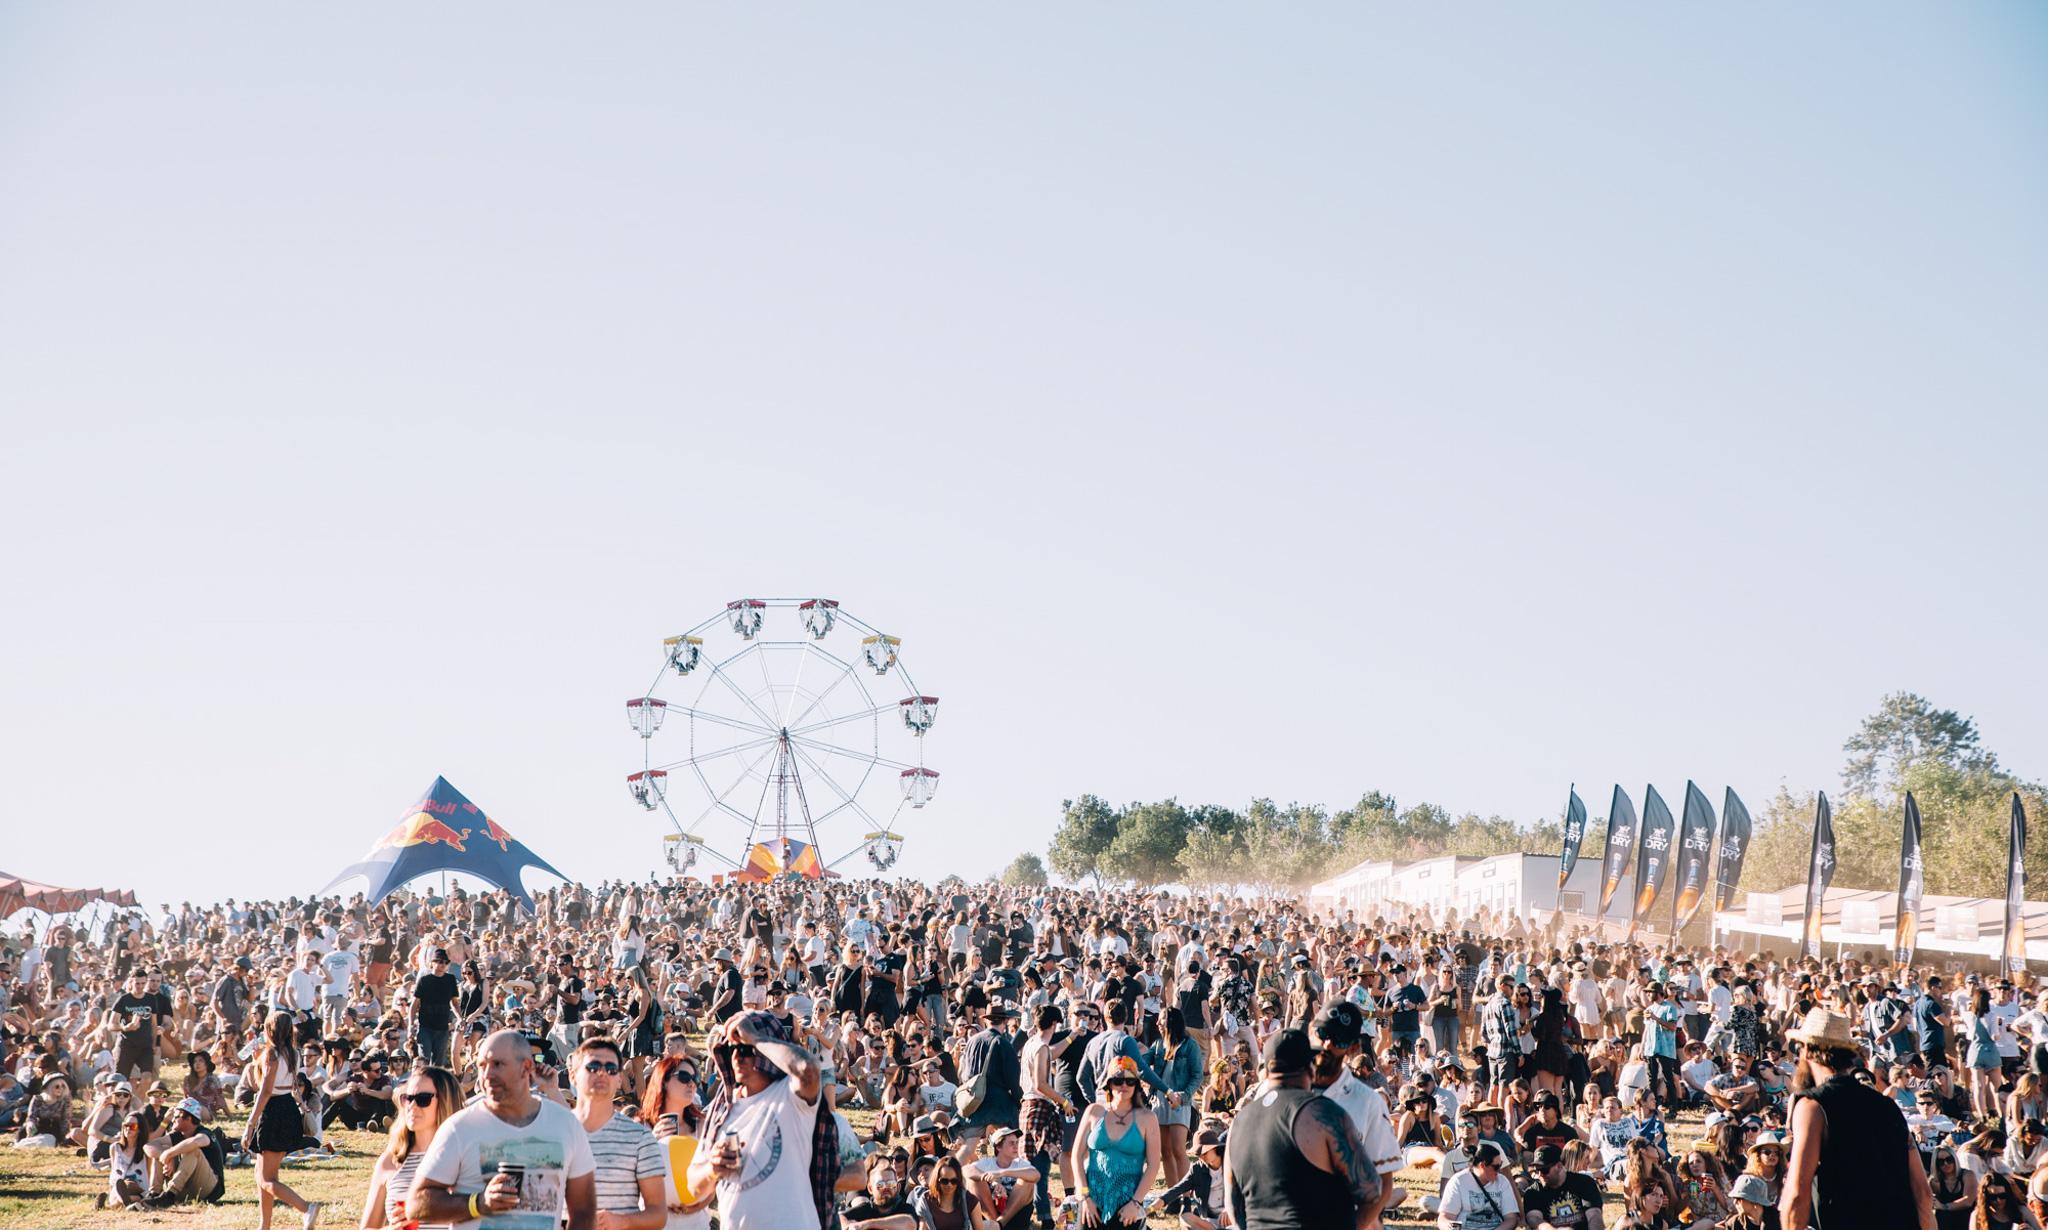 Big Pineapple Festival 2016